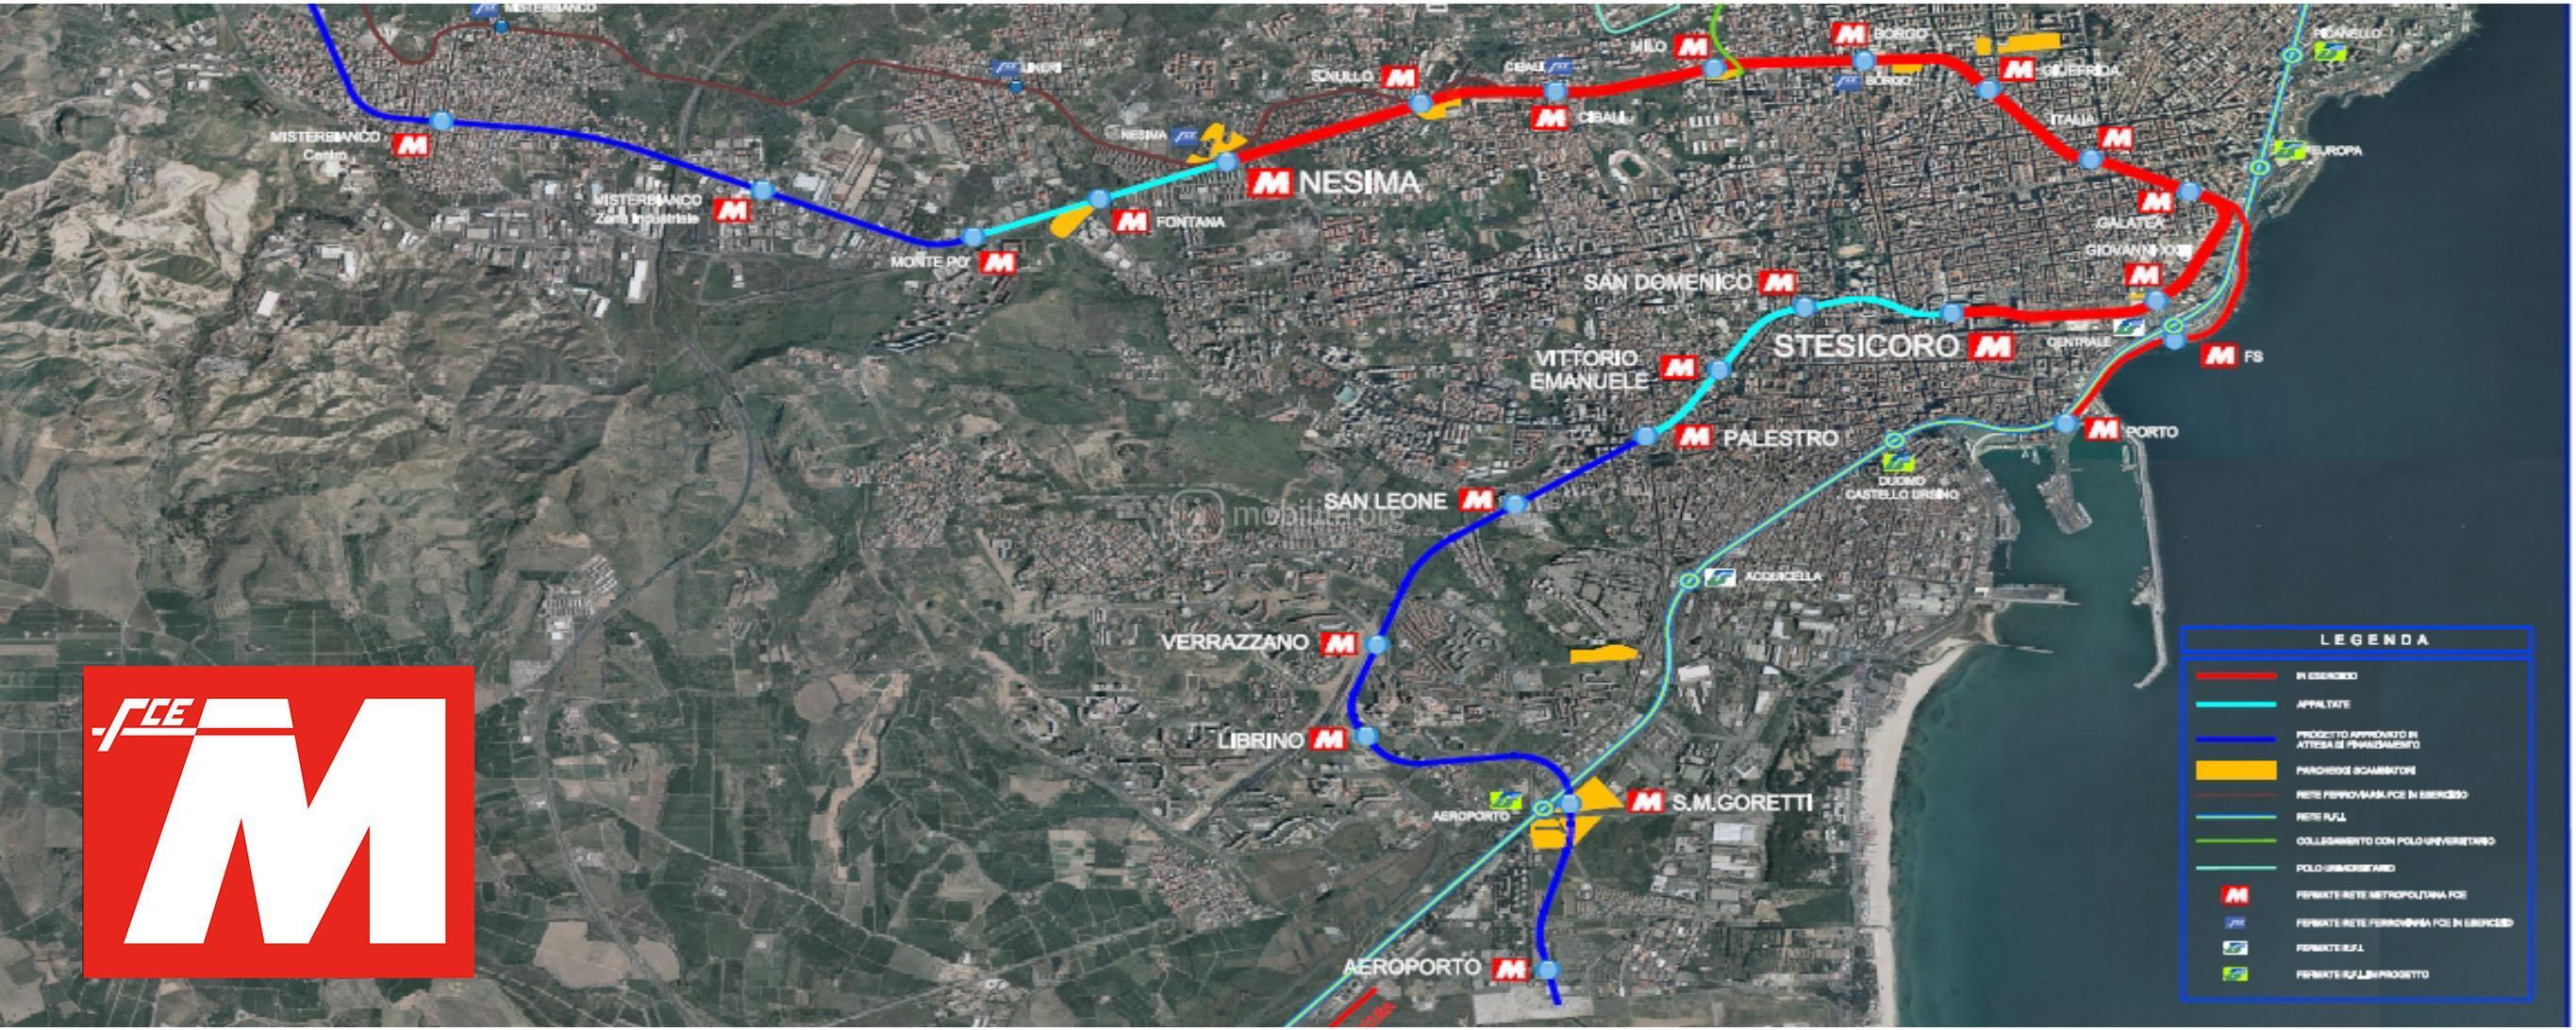 Imprese Di Costruzioni Catania metropolitana di catania: storia e sviluppi futuri